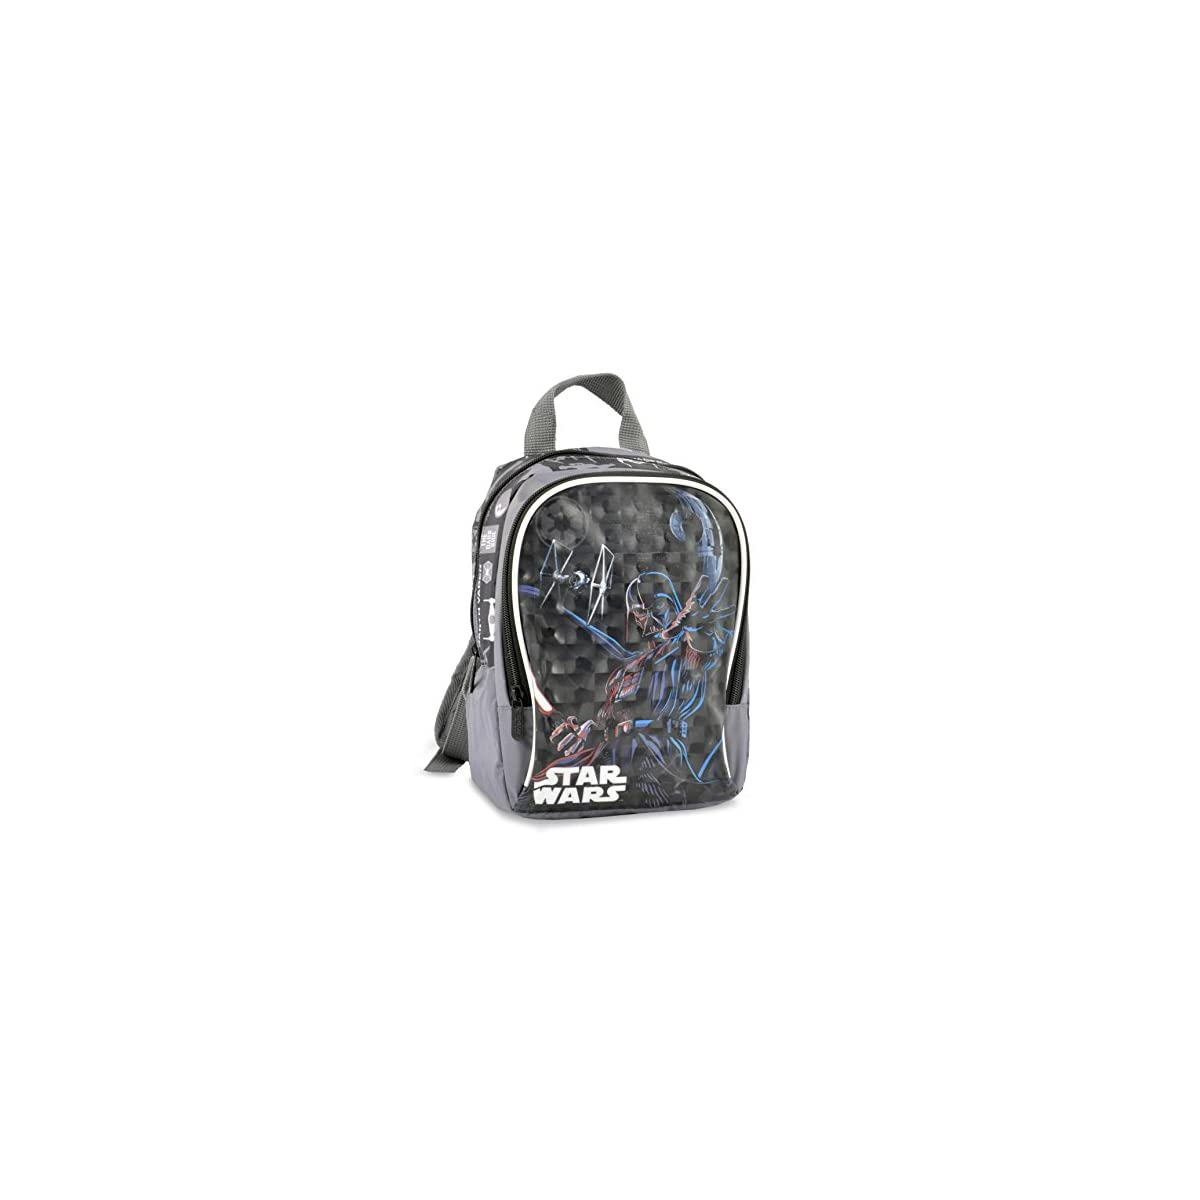 515e2yENEZL. SS1200  - Maly plecak Star Wars